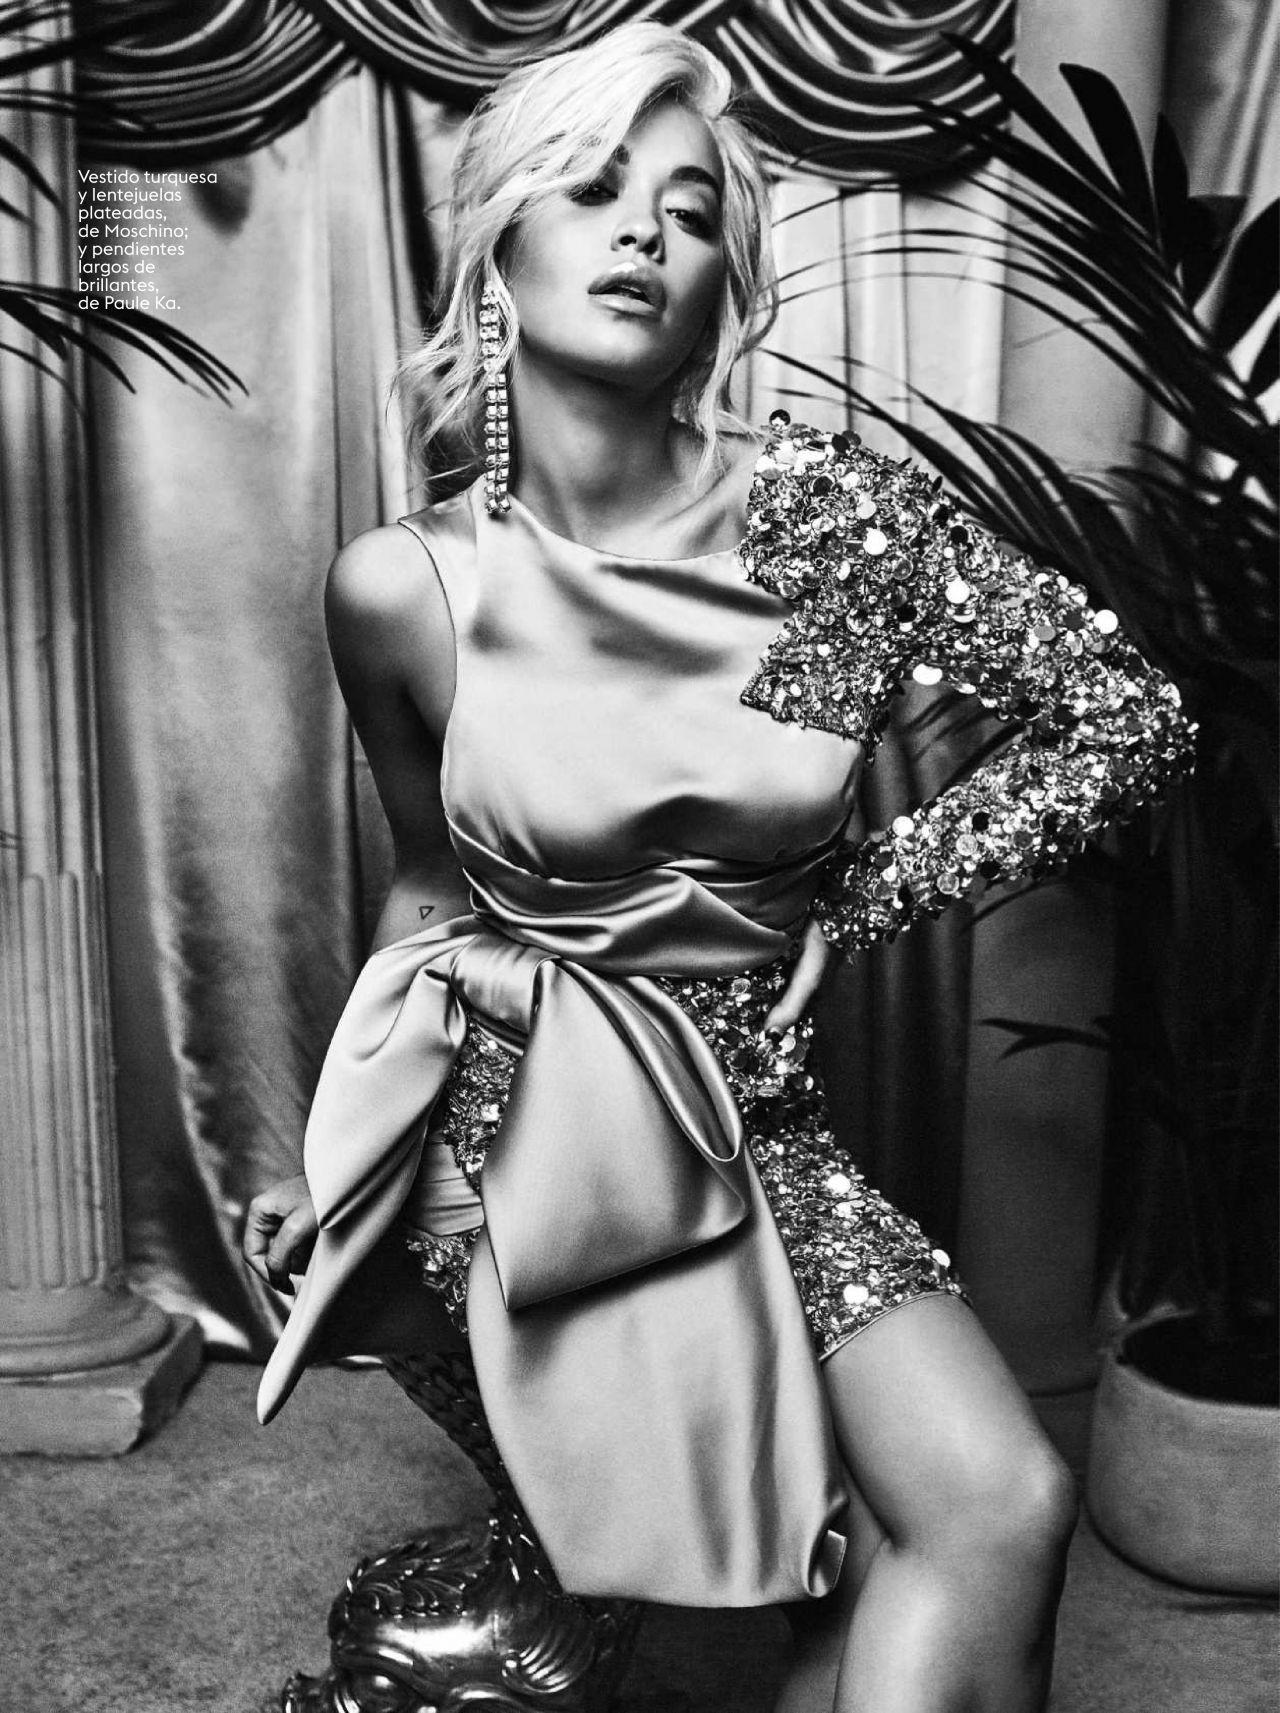 https://celebmafia.com/wp-content/uploads/2018/11/rita-ora-glamour-magazine-spain-11-2018-2.jpg